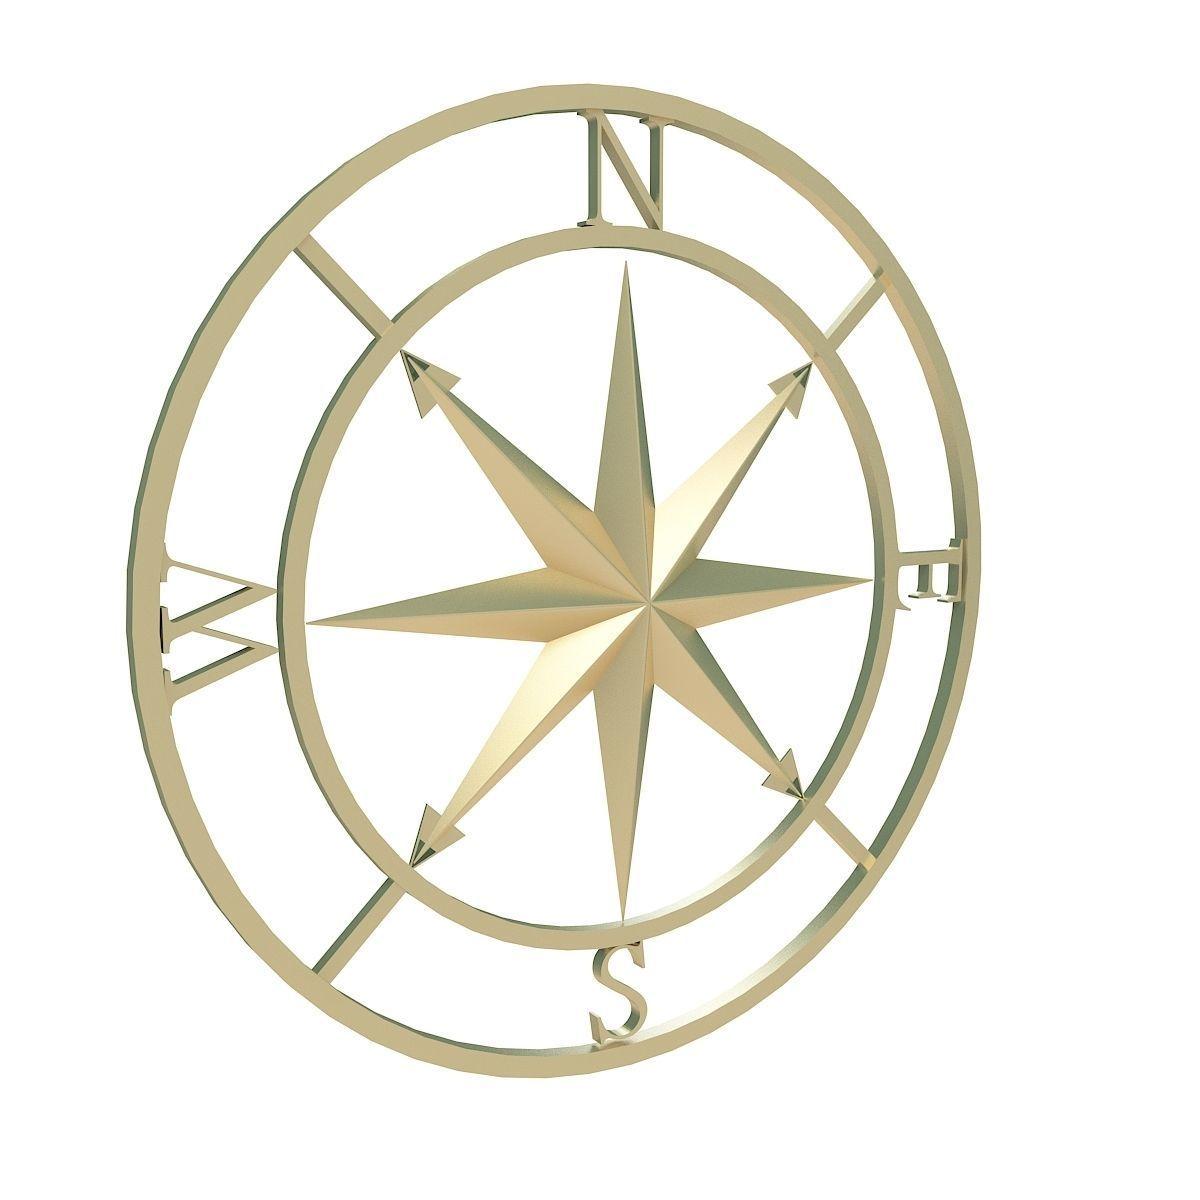 Compass rose 3D model MAX OBJ 3DS FBX DXF